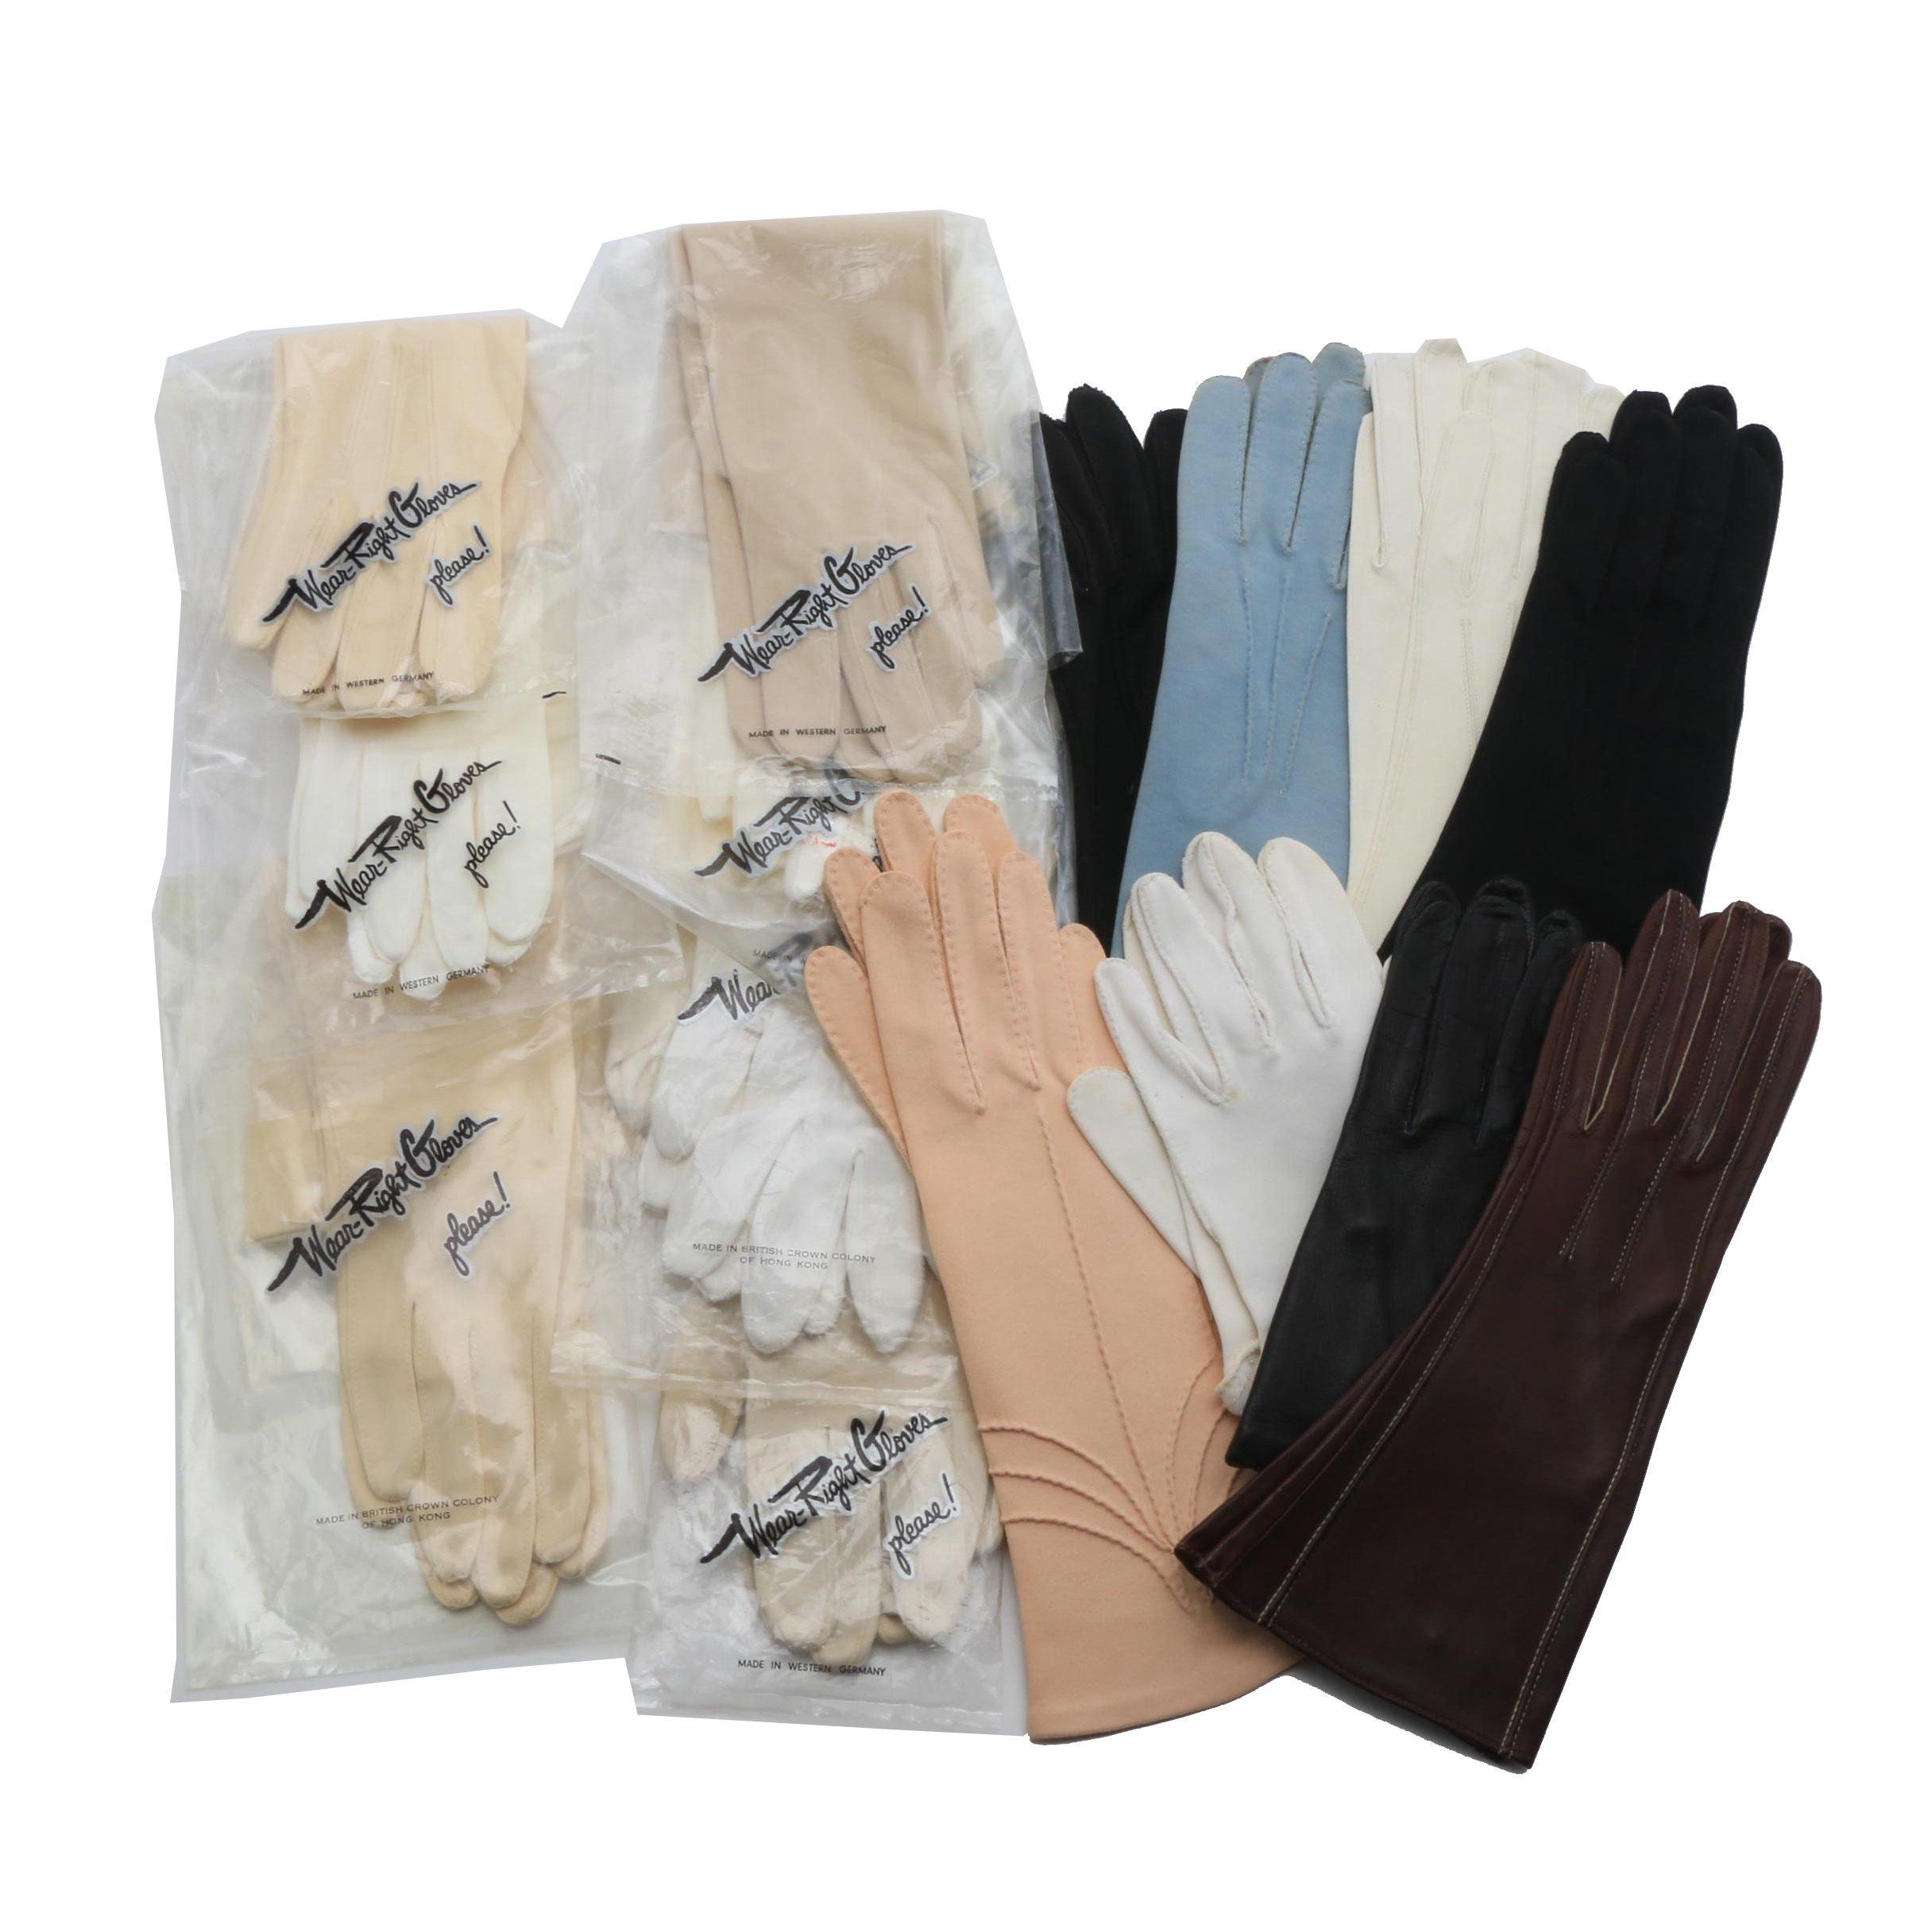 Fourteen Pair of Vintage Gloves in Variety of Styles